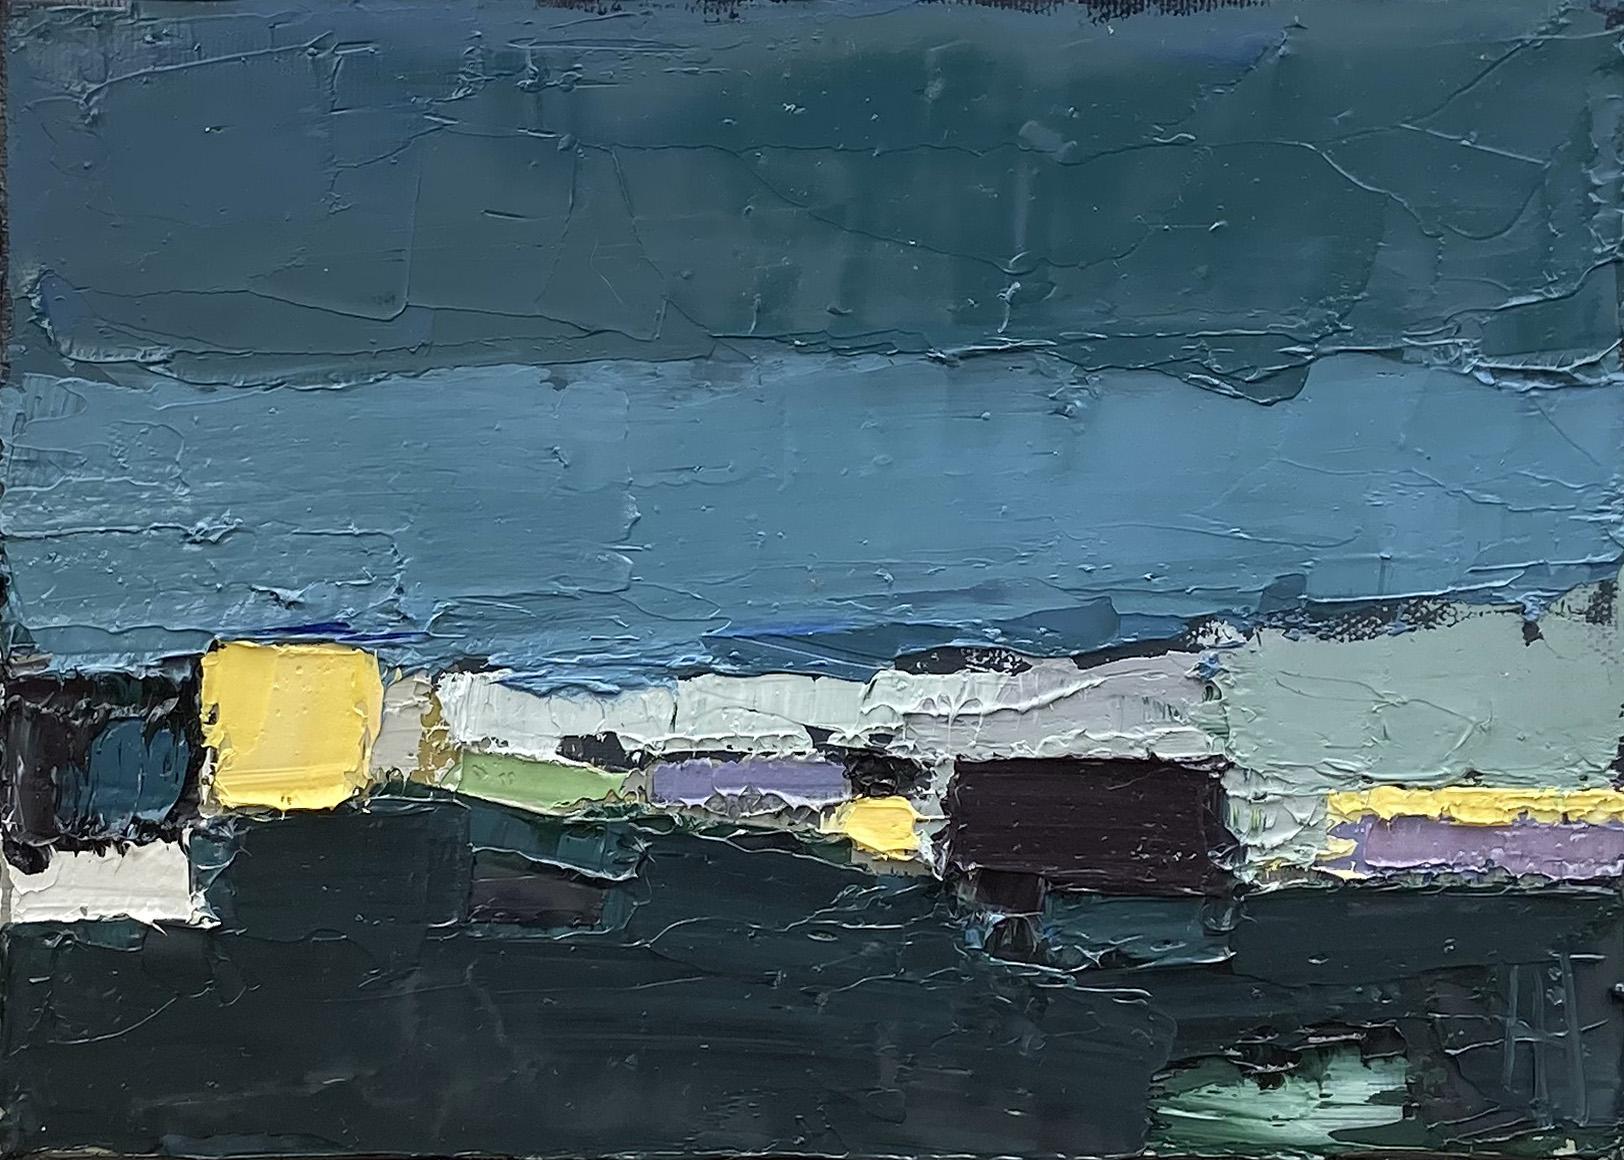 N° 200317 • 27 x 19 cm • © HOËT